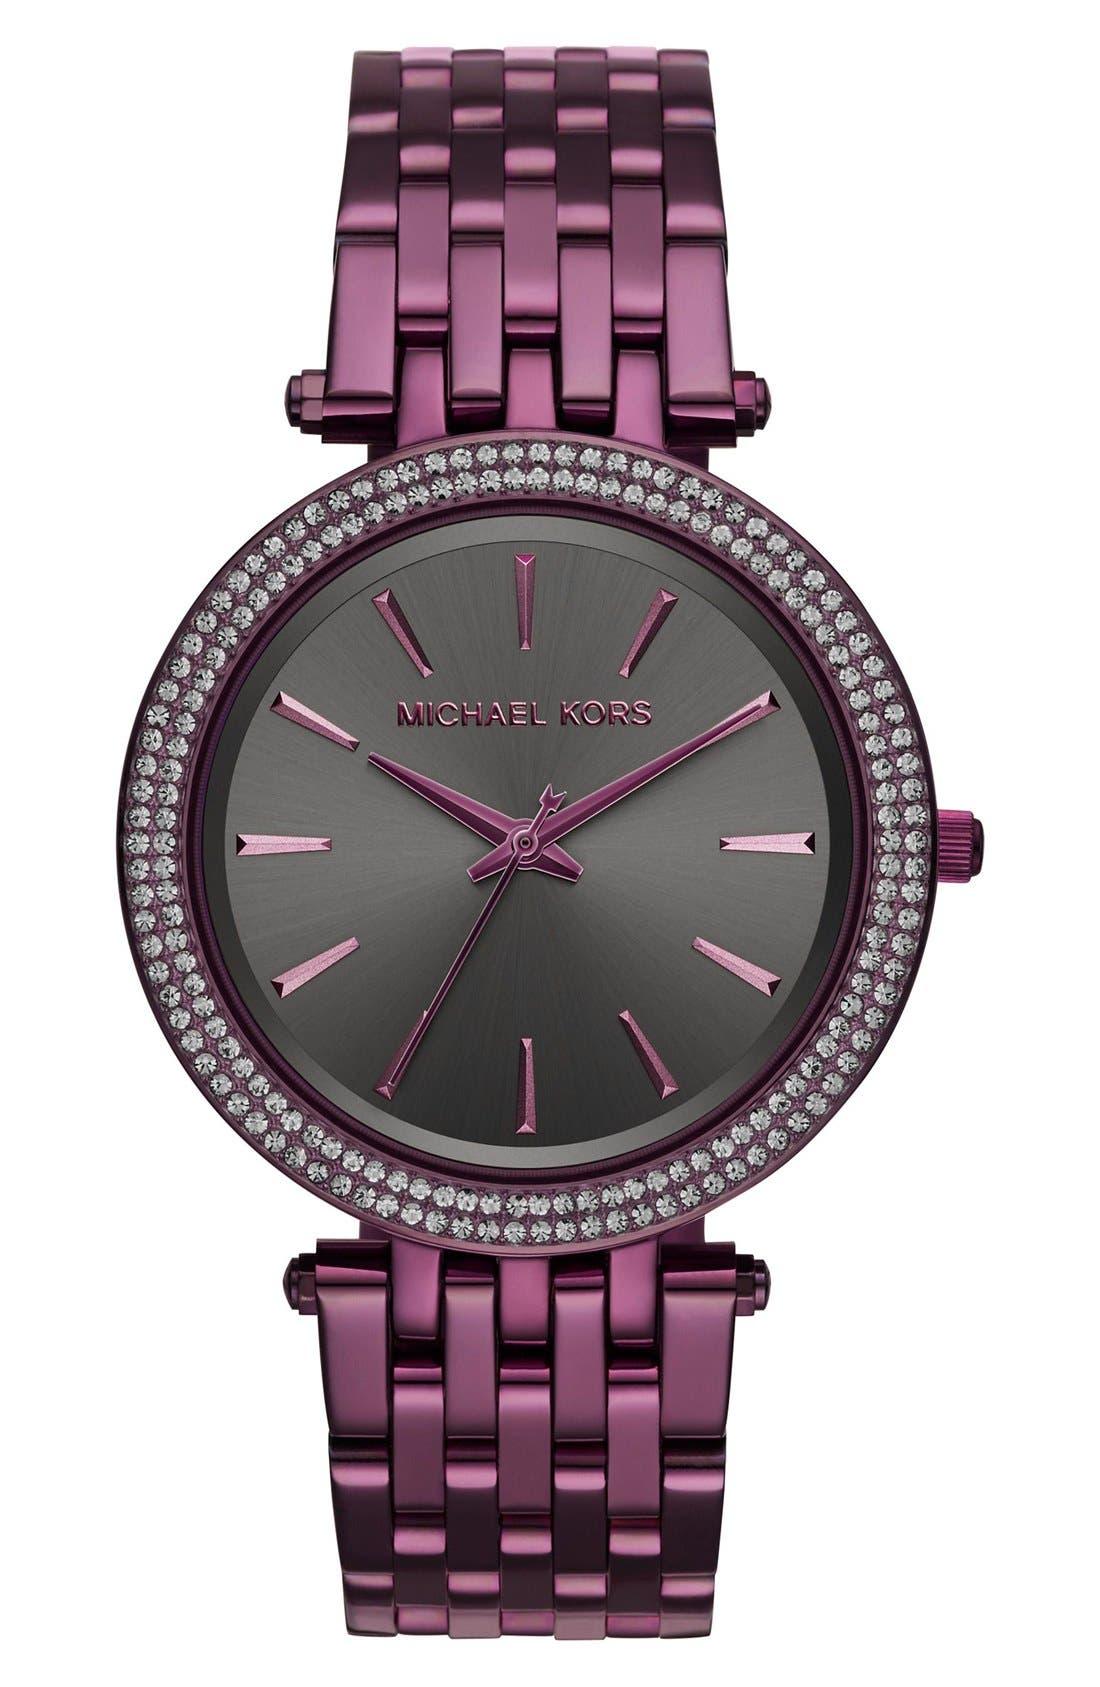 Main Image - Michael Kors 'Darci' Bracelet Watch, 39mm